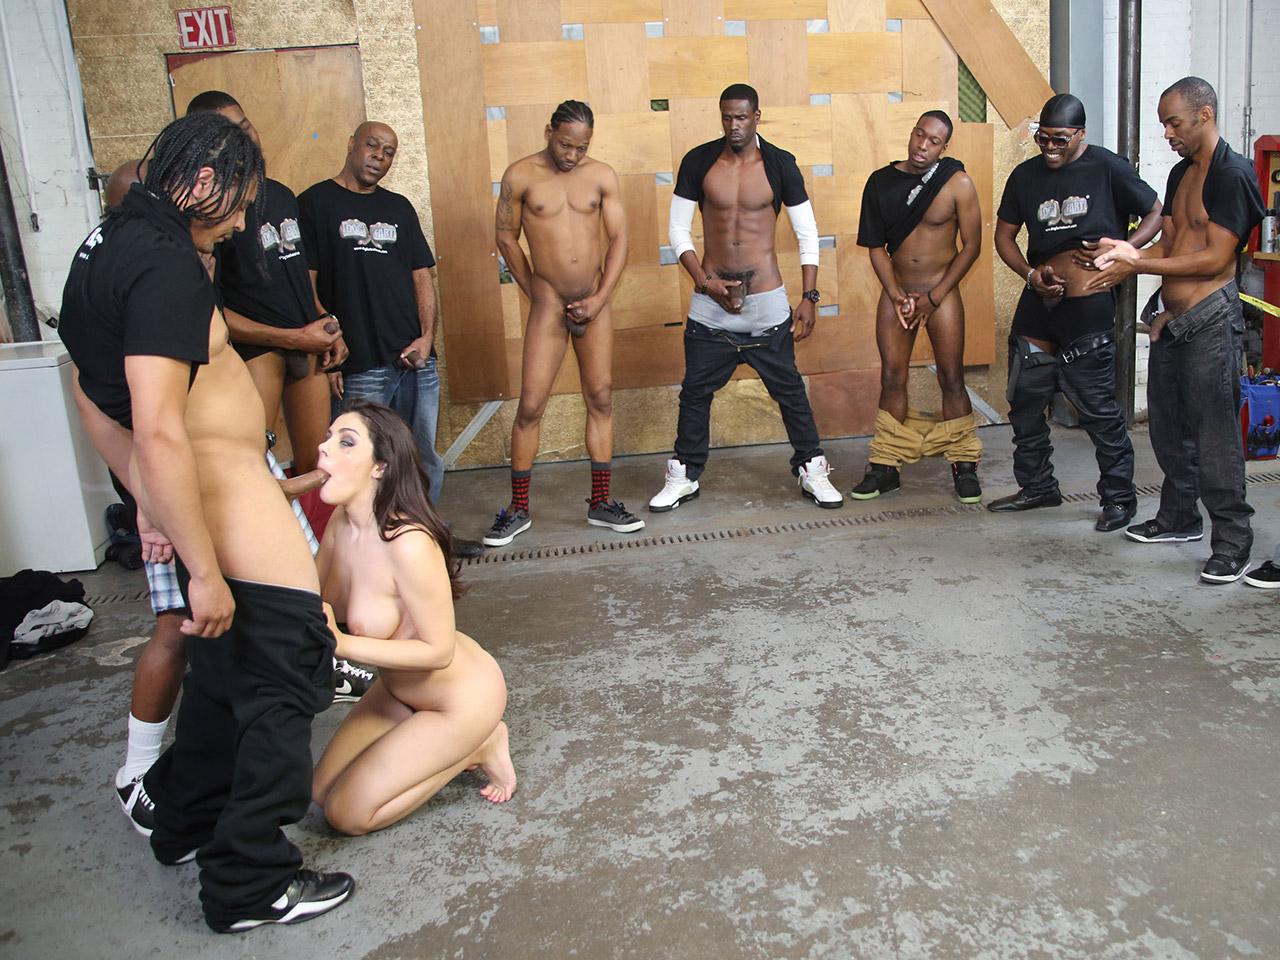 Mobile Porn Free Mobile Porn Mobile XXX Videos Mobile Porn Movies. Mobile Porn Free Mobile Porn Mobile XXX Videos Mobile Porn Movies Android Porn